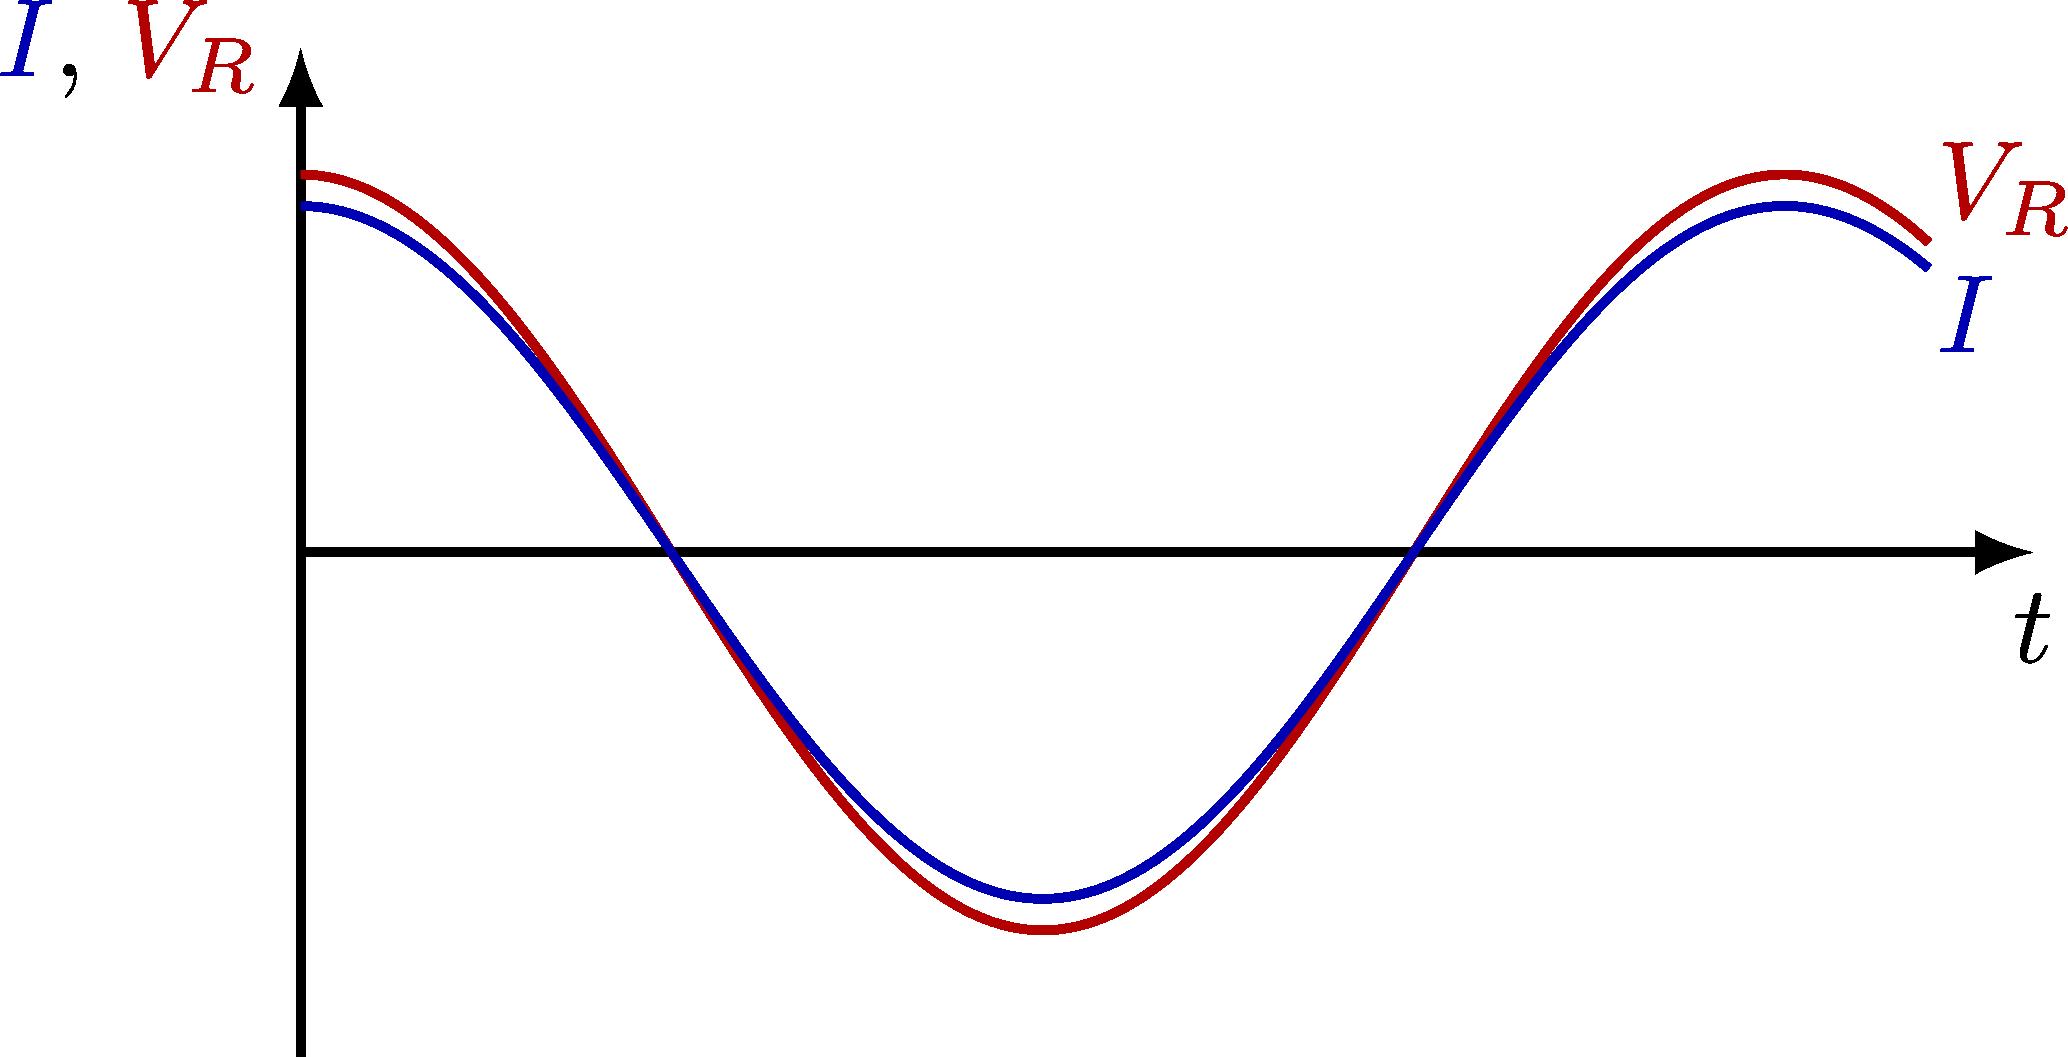 electric_circuit_ac_plots-001.png